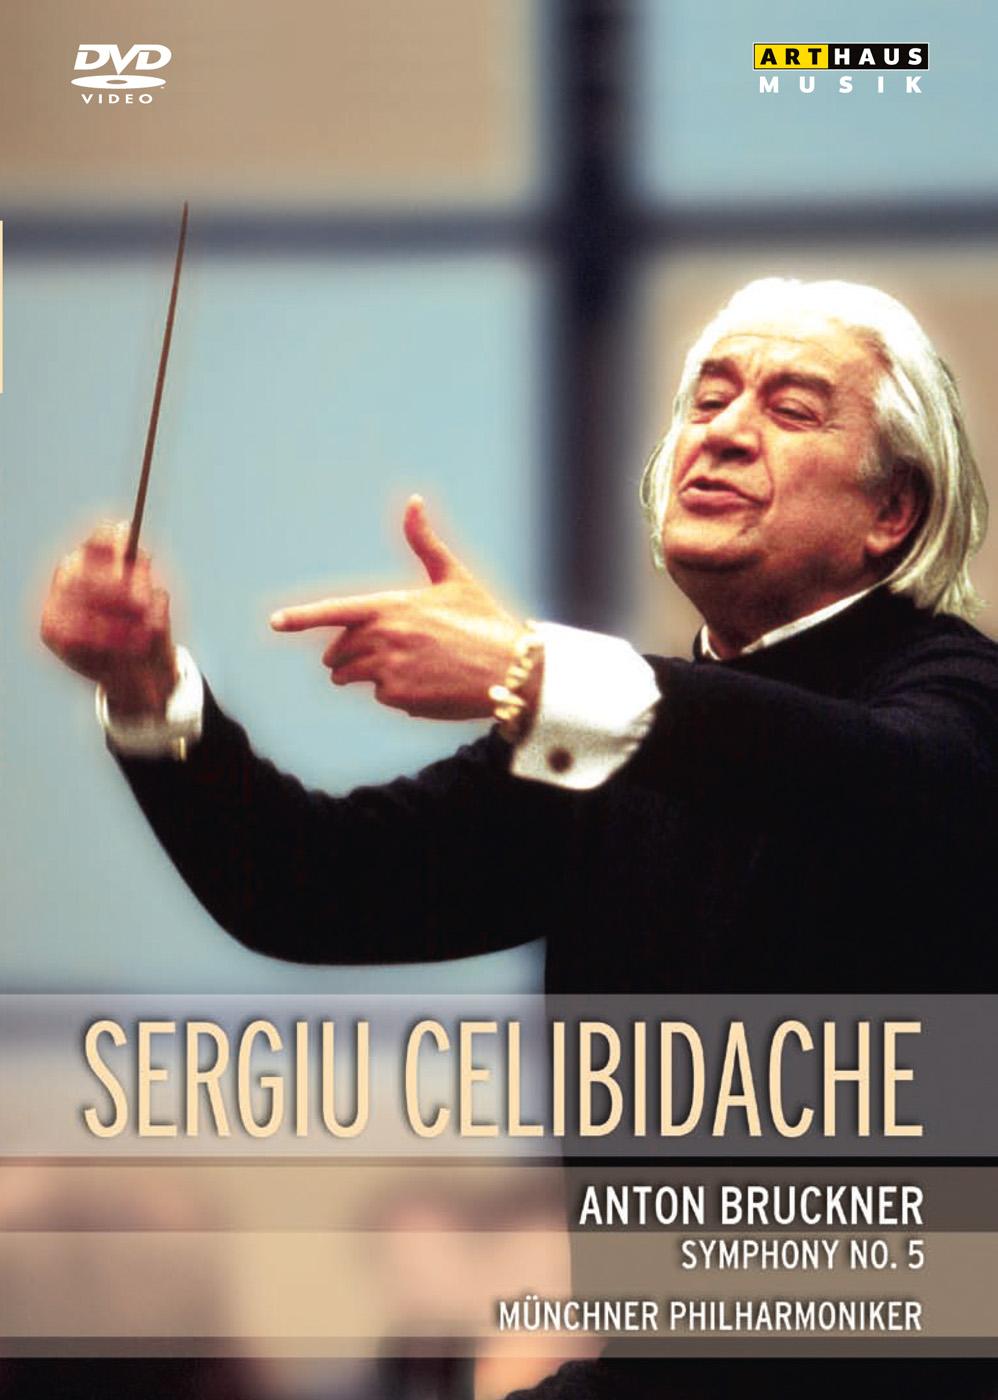 Sergiu Celibidache: Anton Bruckner - Symphony No. 5